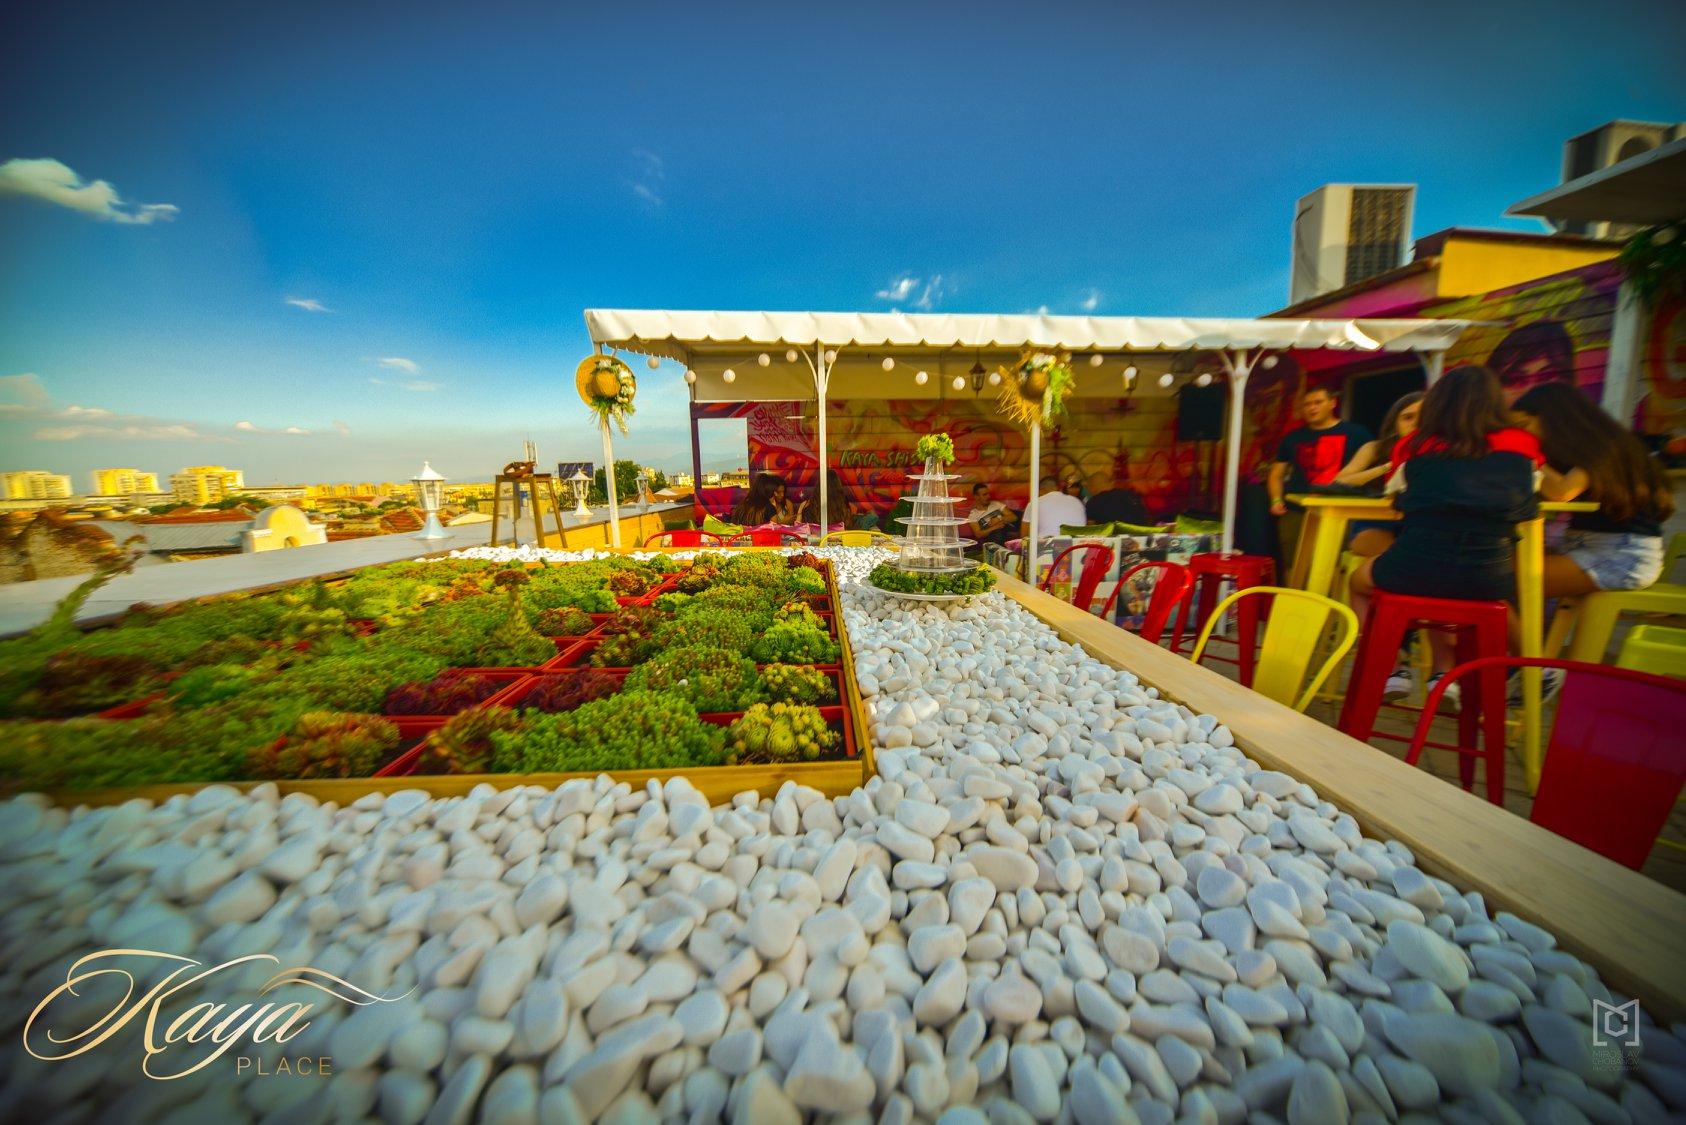 Kaya Place - Roof Opening